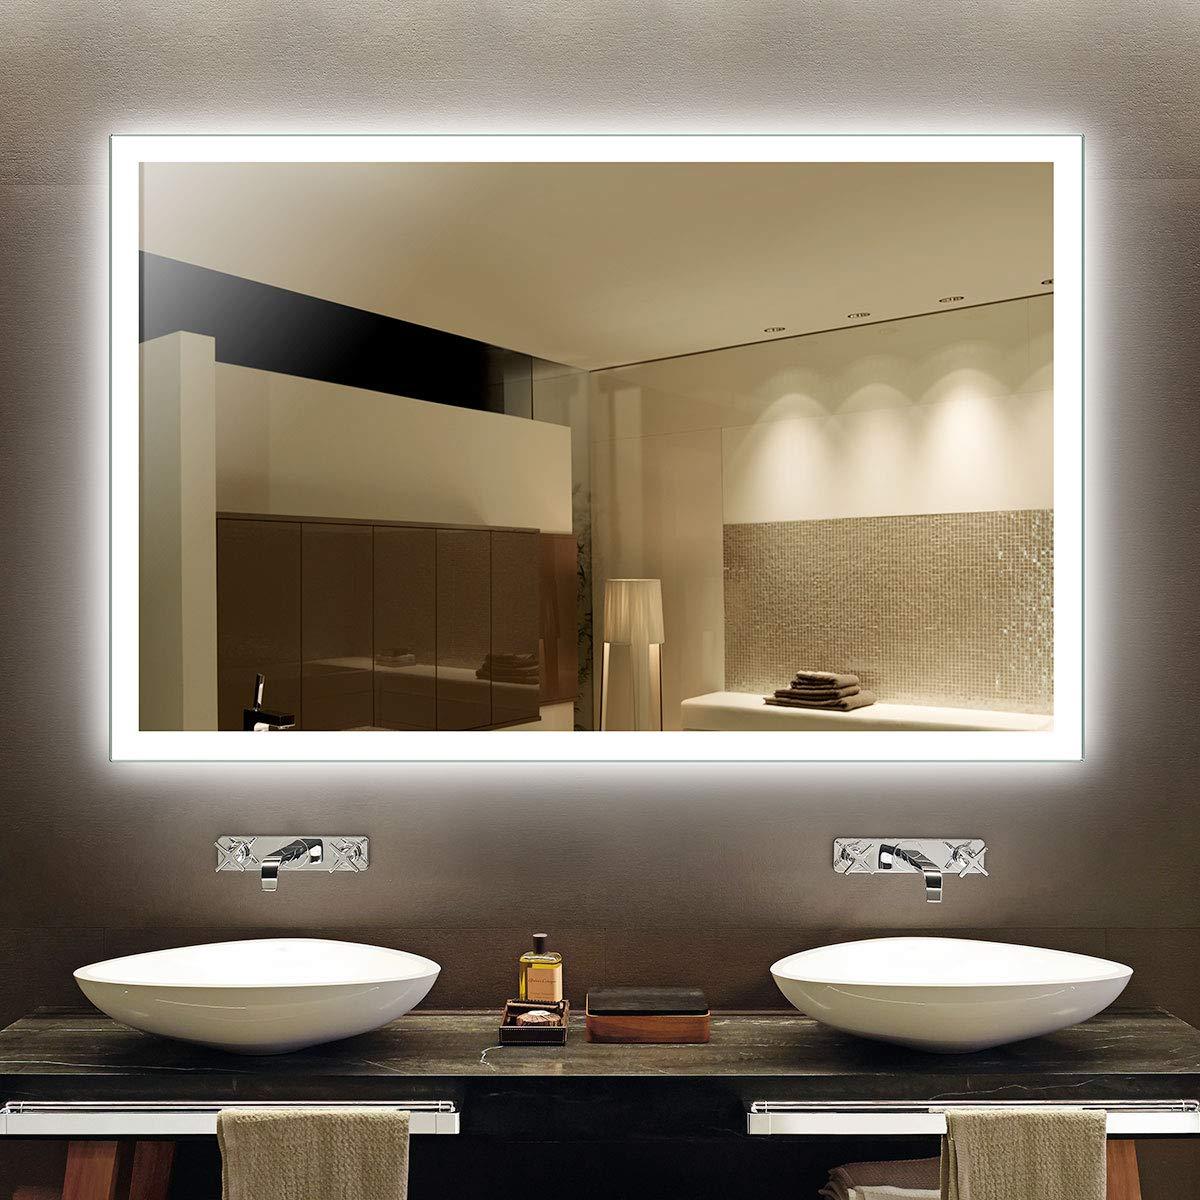 DECORAPORT LED Lighted Bathroom Makeup Mirror, 55x36 in Led Wall Mounted Backlit Bathroom Vanity Mirror Silvered Mirror Infrared Sensor Horizontal/Vertical (N031-CG)